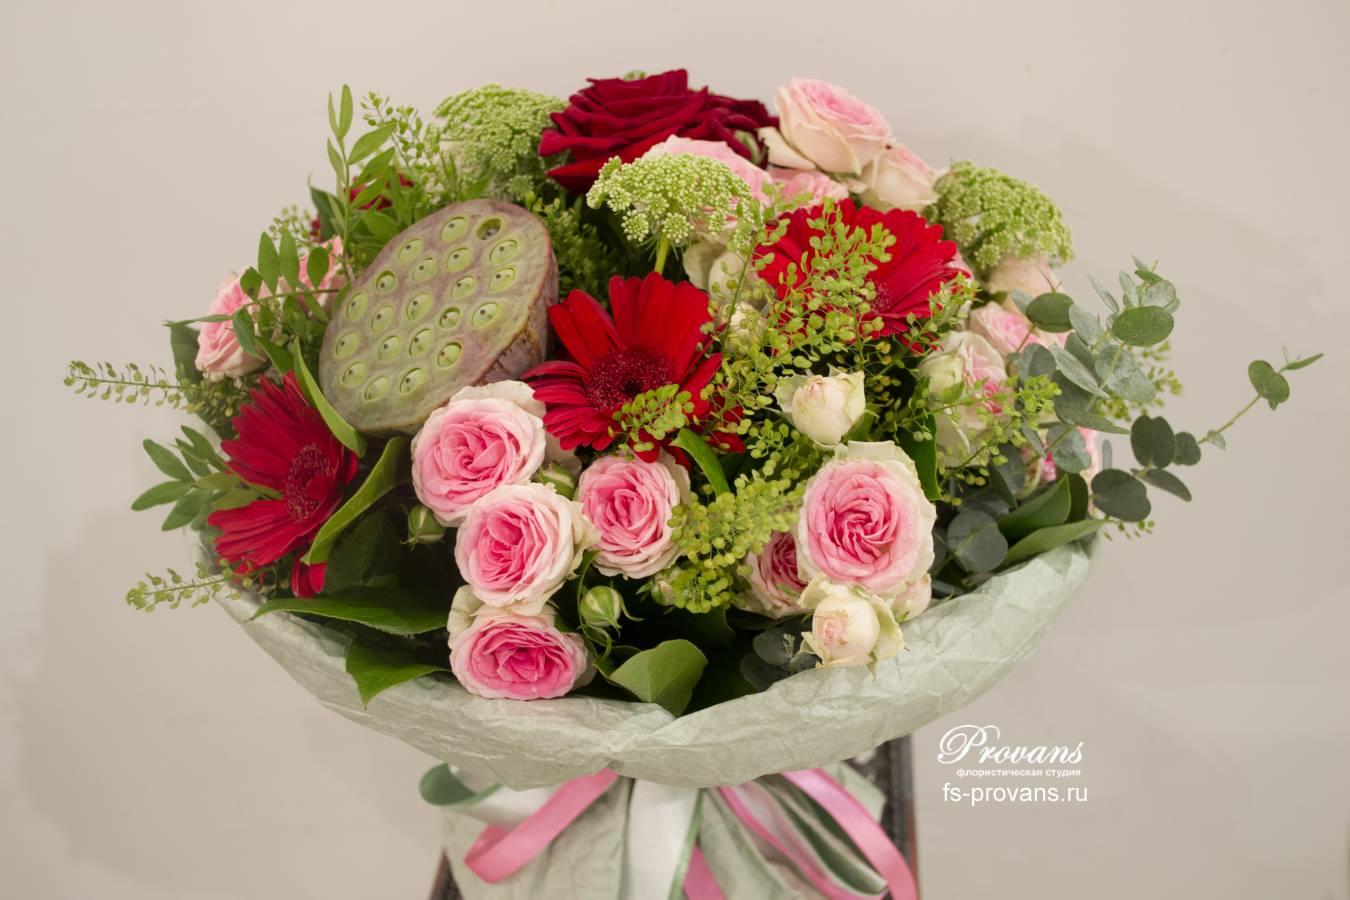 Фото цветов для марии